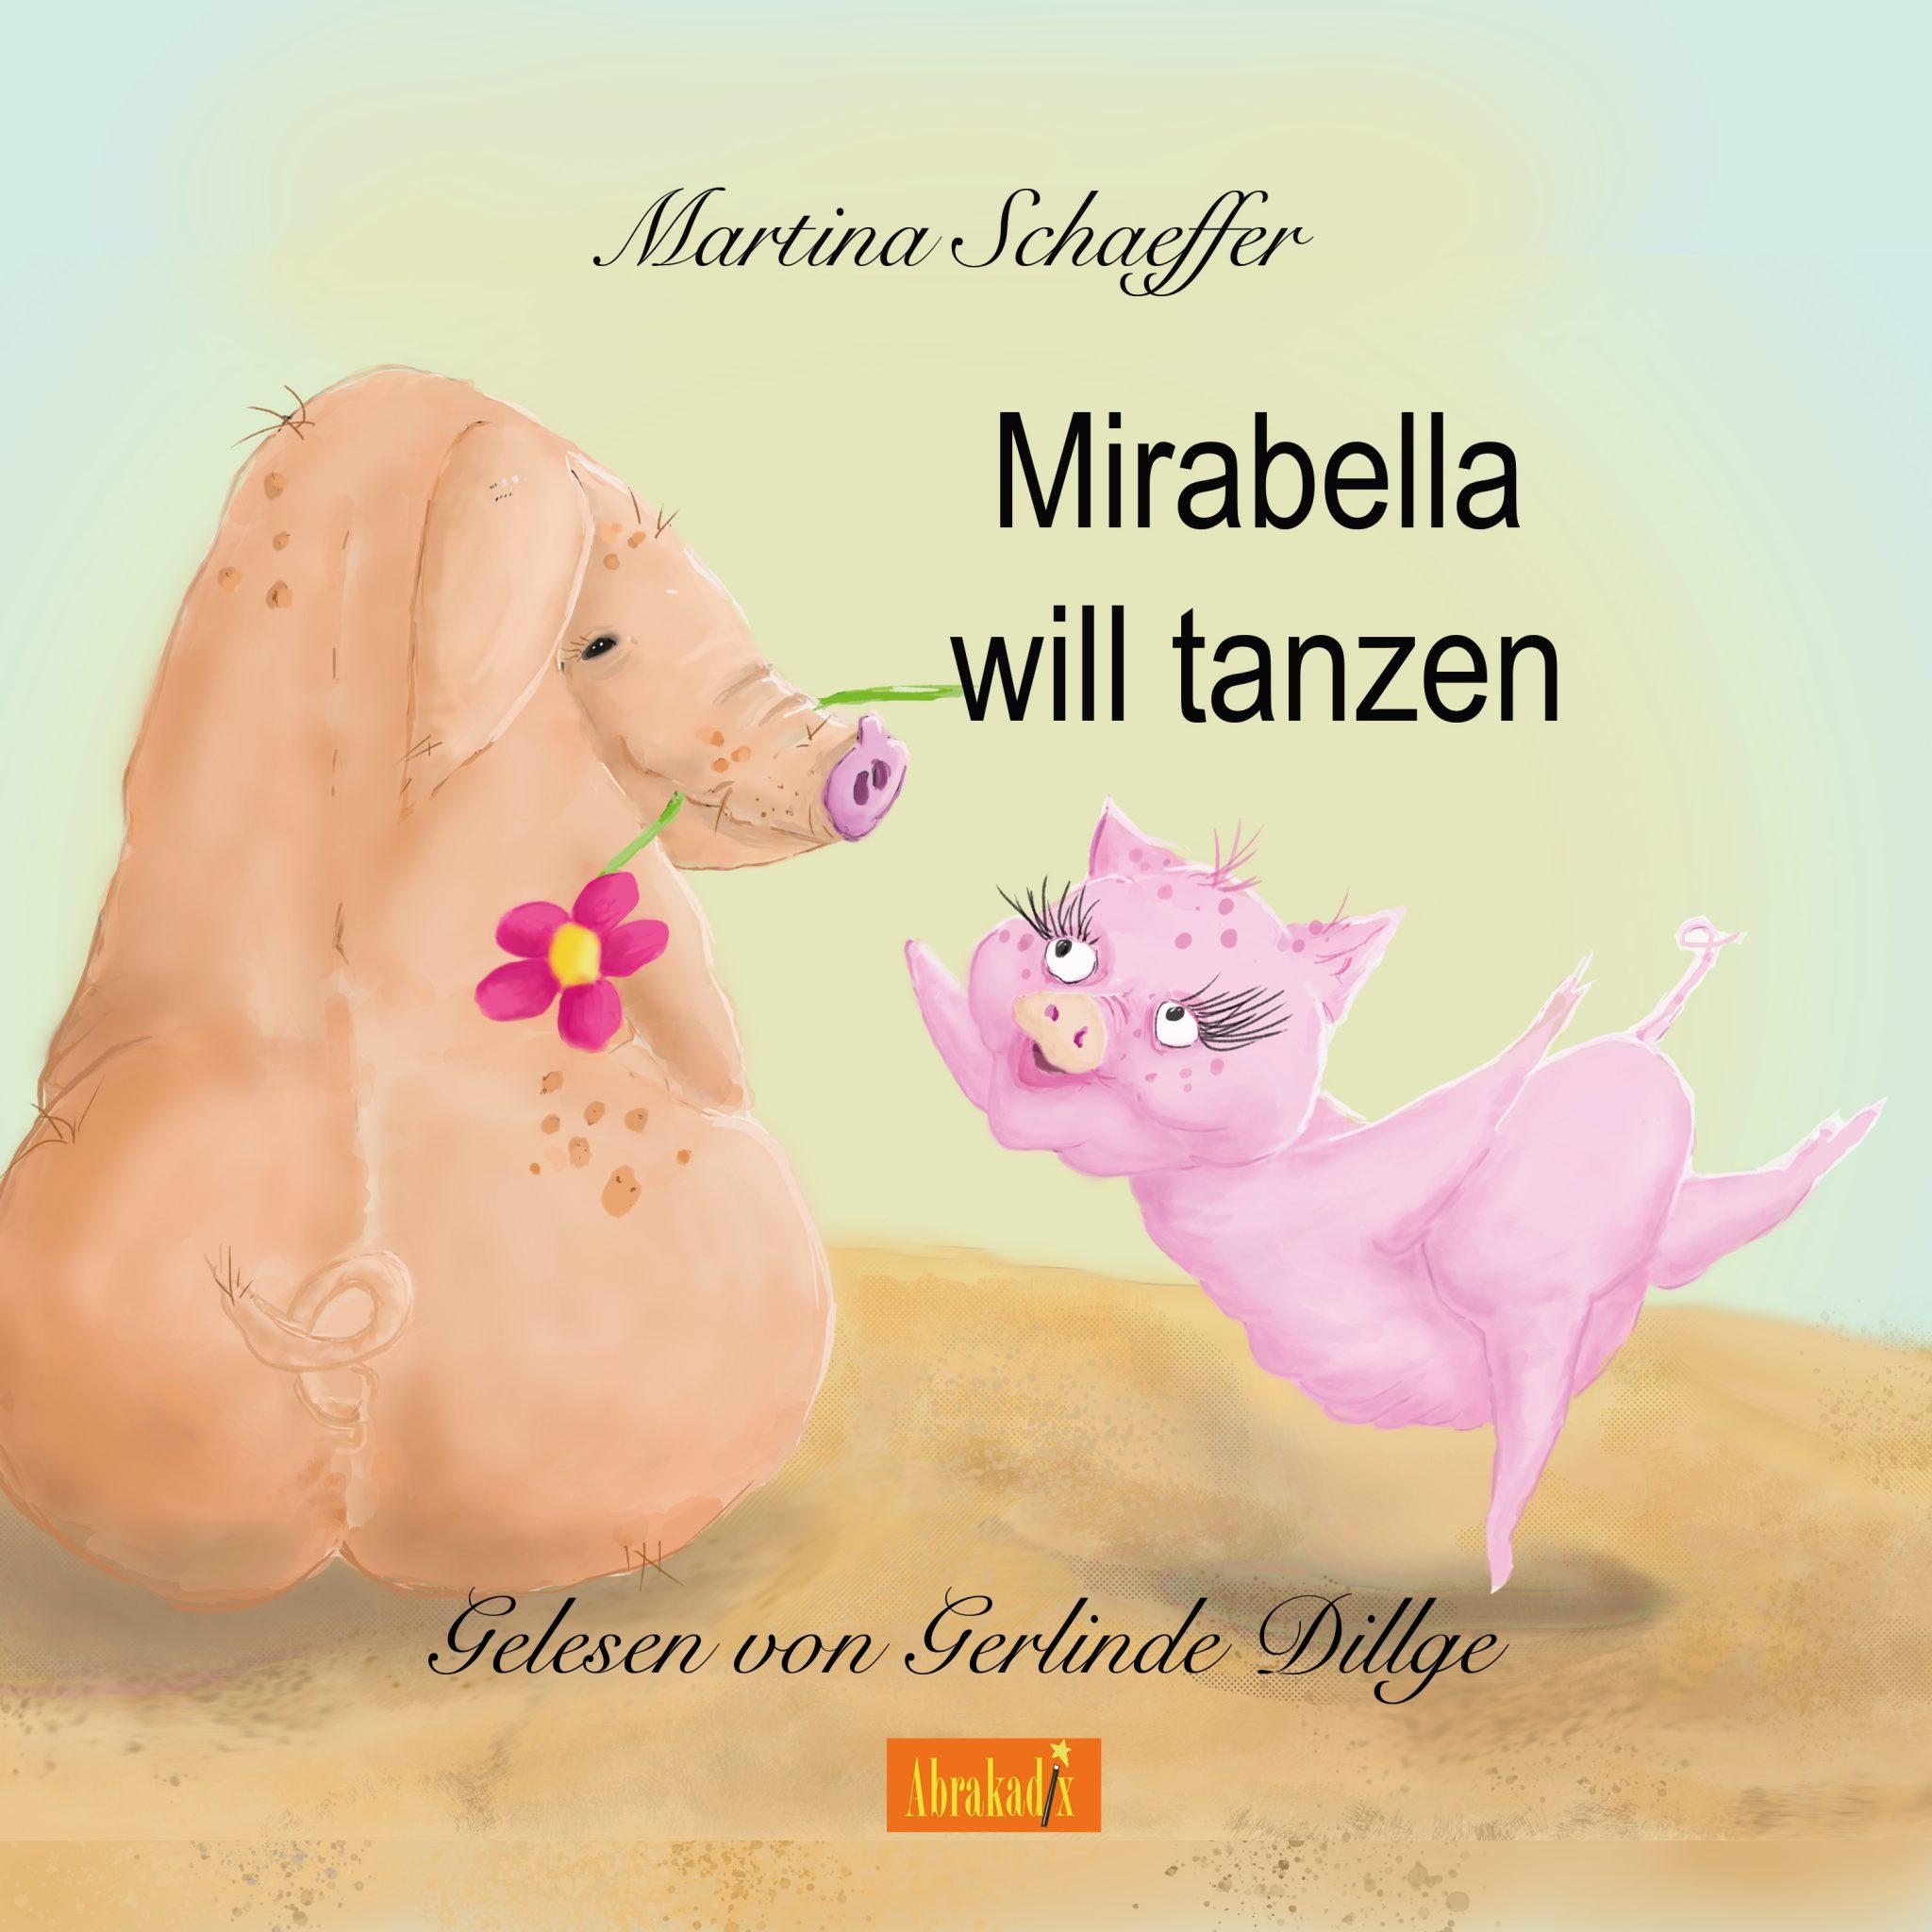 Mirabella will tanzen